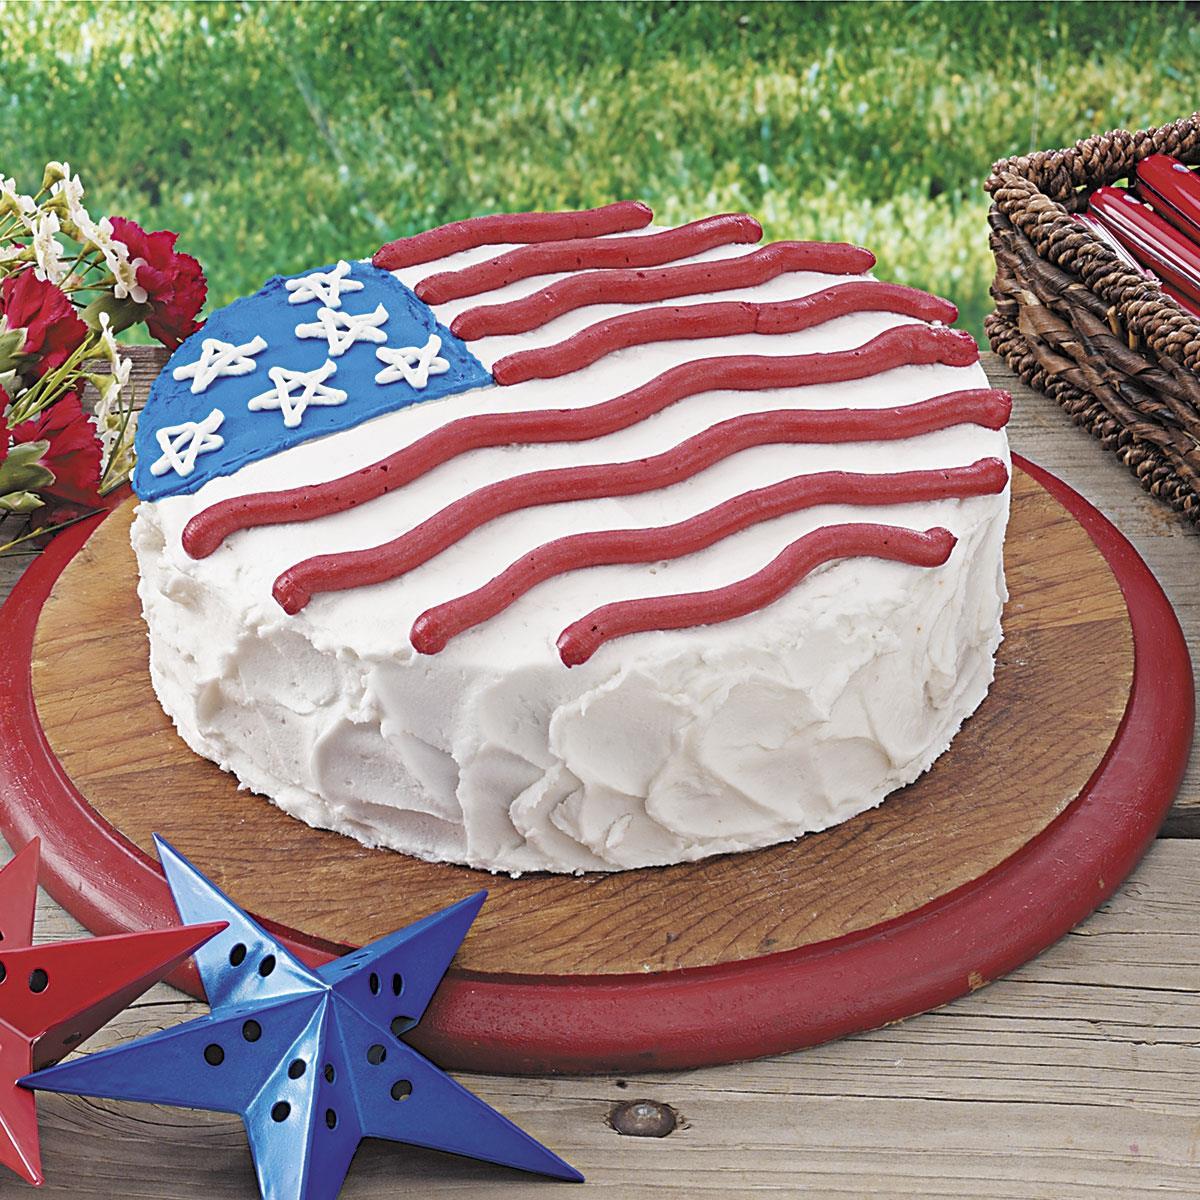 Patriotic Cake Recipe Taste Of Home